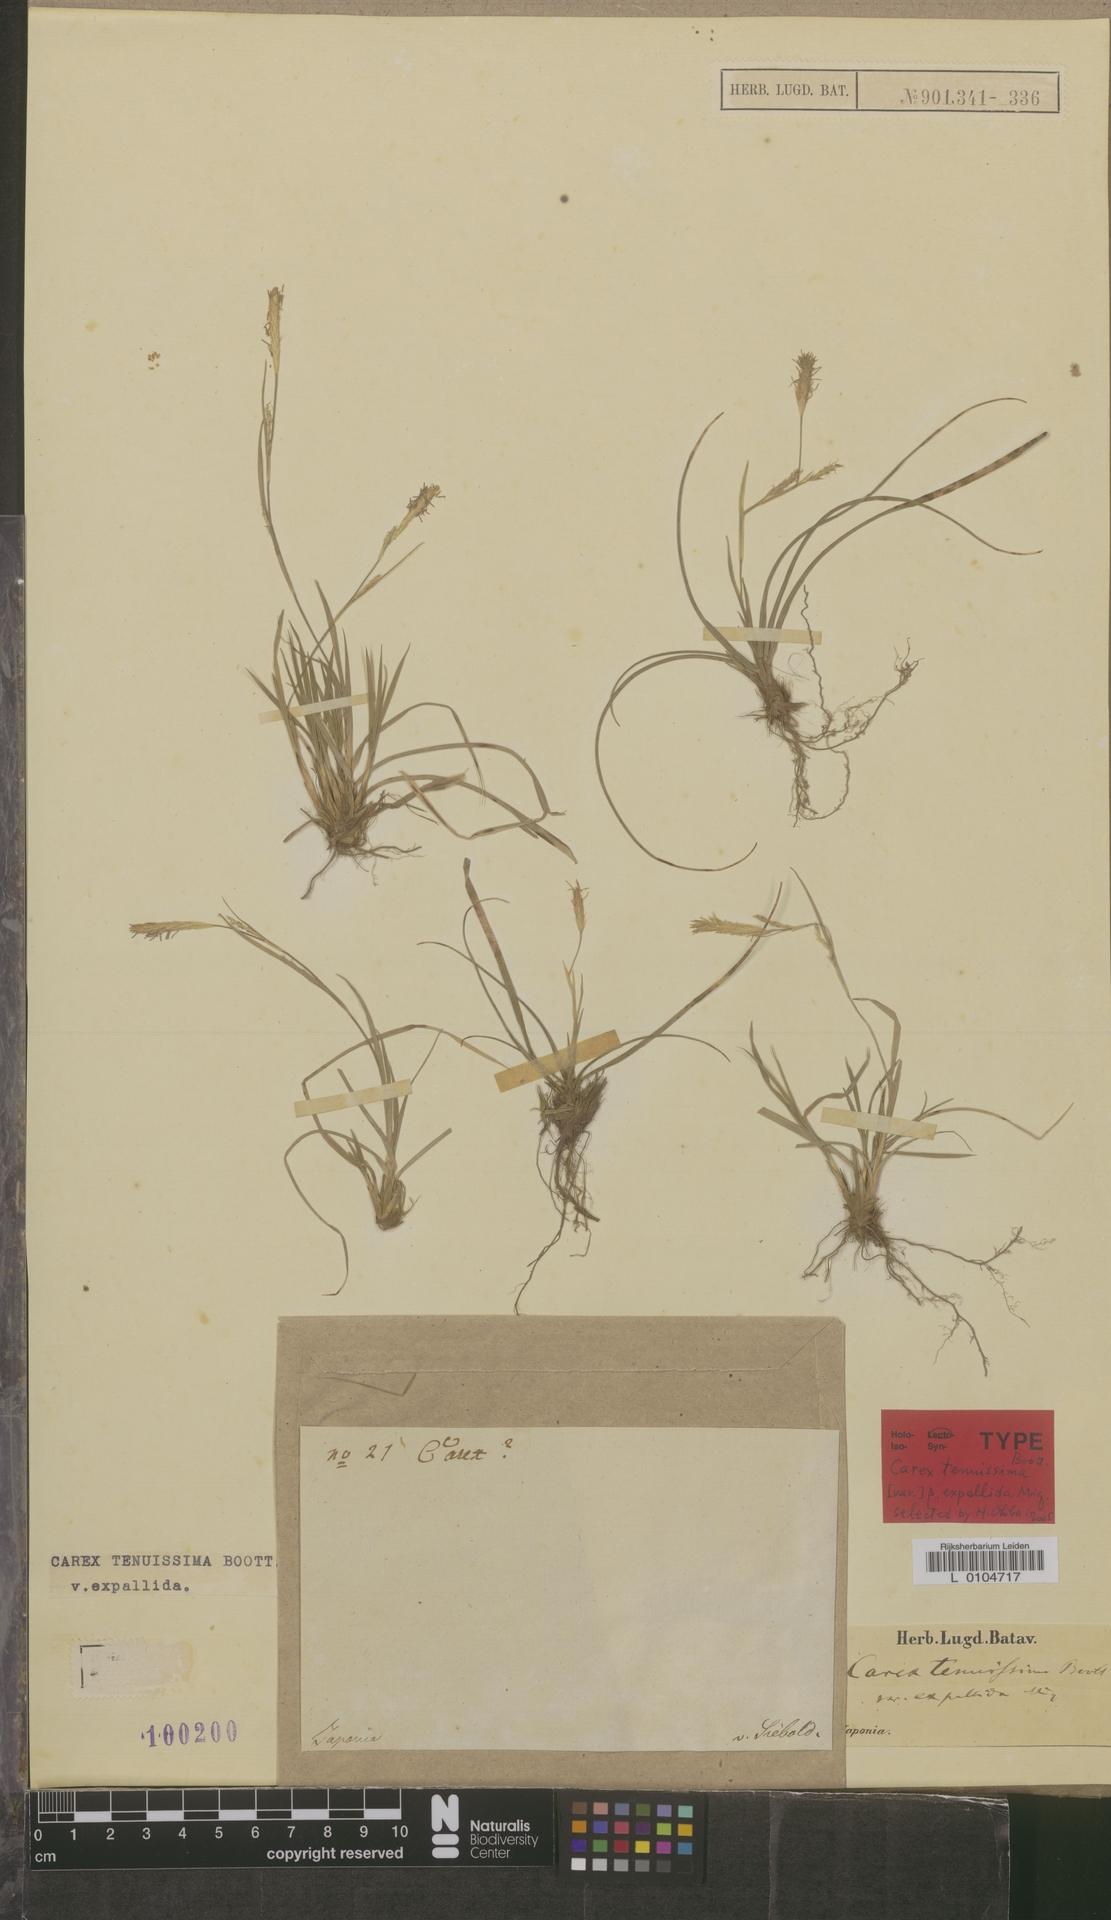 L  0104717 | Carex tenuissima var. expallida Miq.